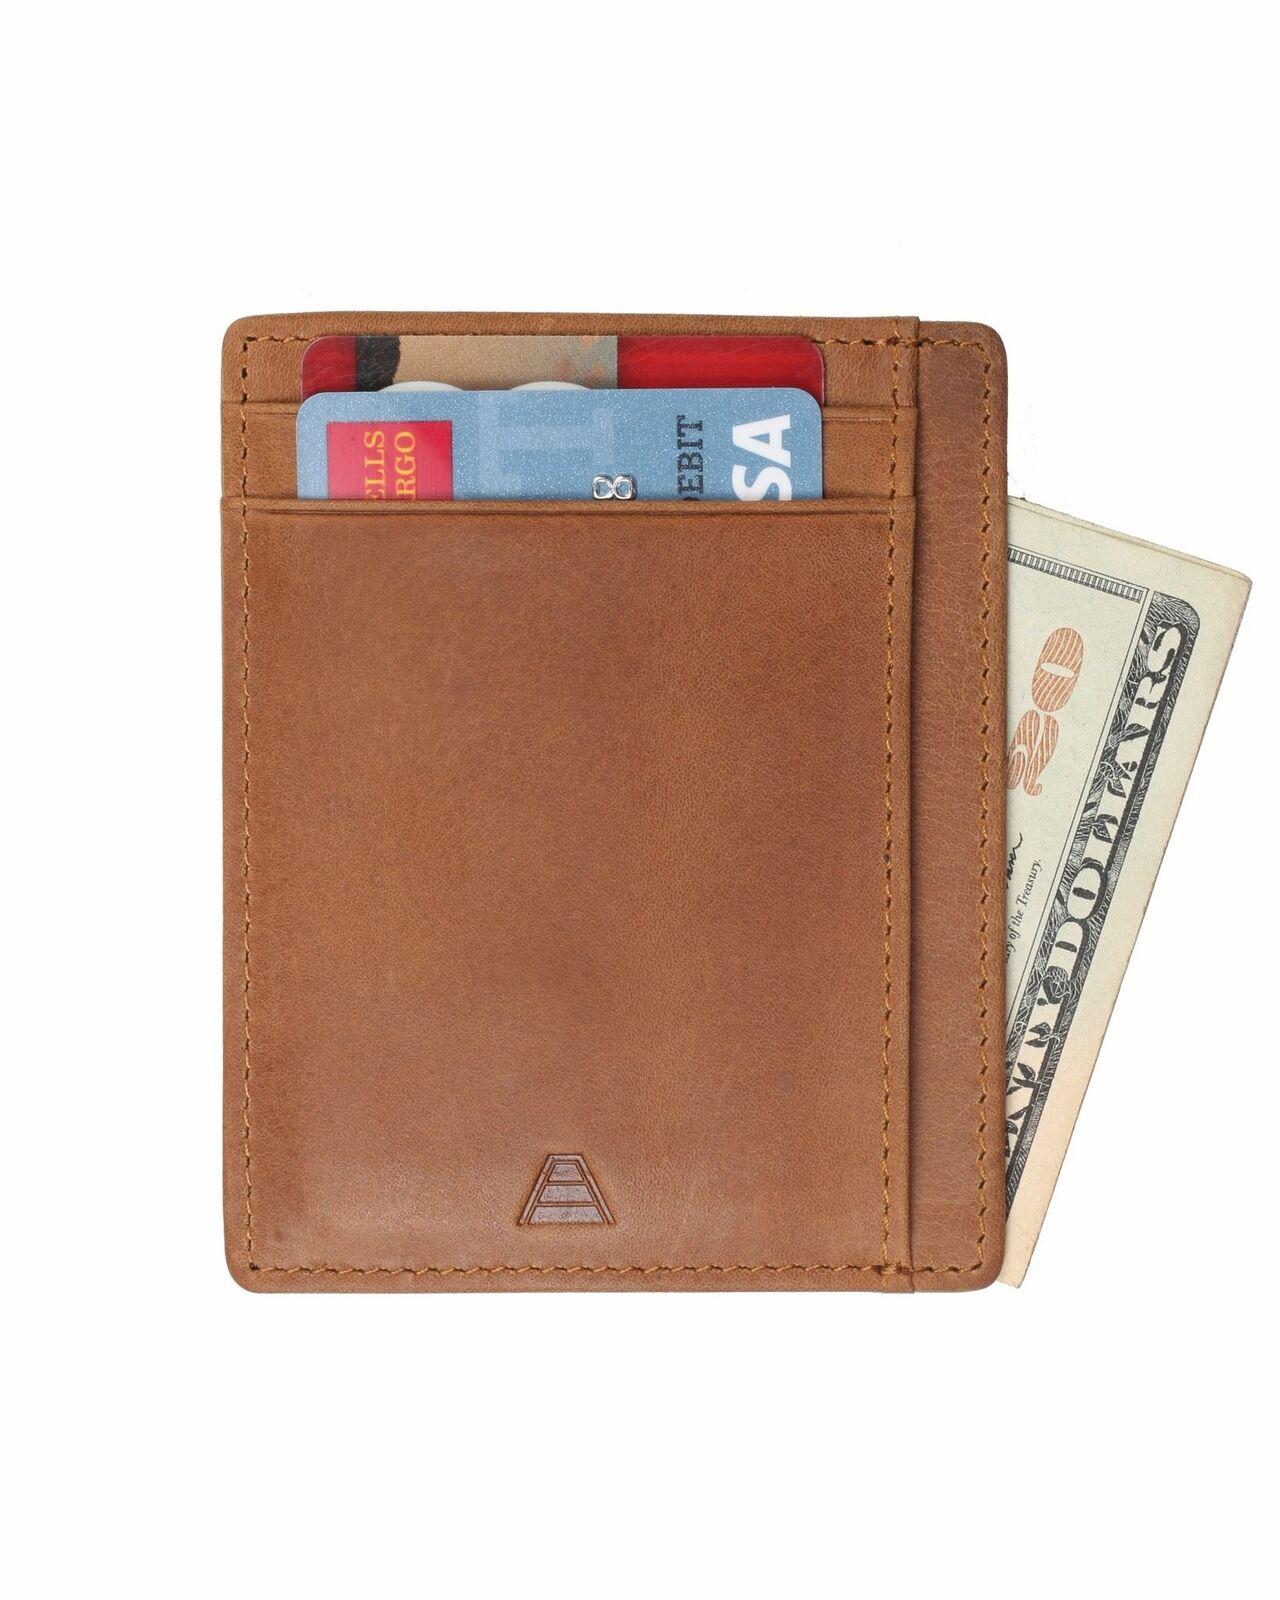 Andar - Slim, Front Pocket, RFID Block, Full Grain Leather Wallet - The Scout